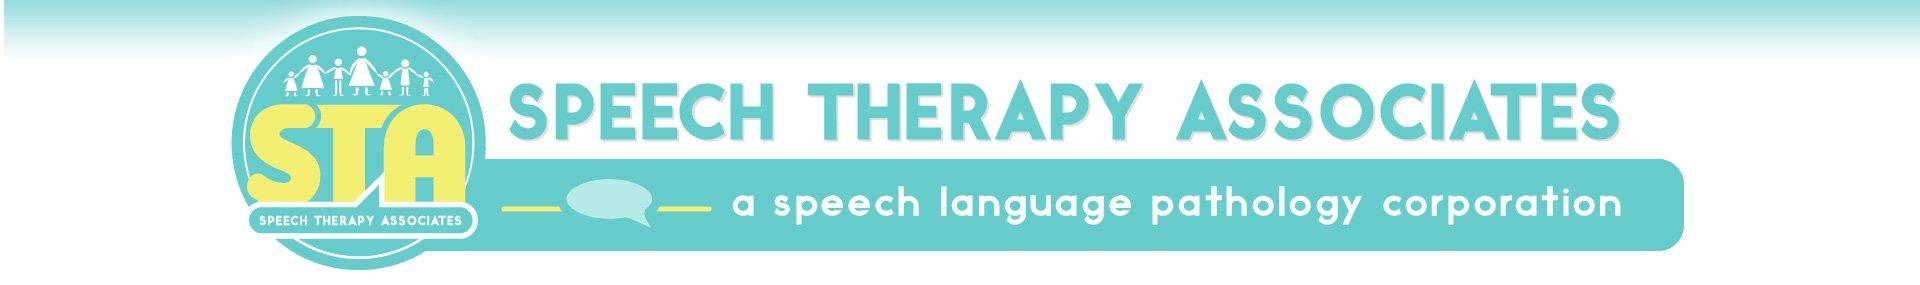 Speech Therapy Associates